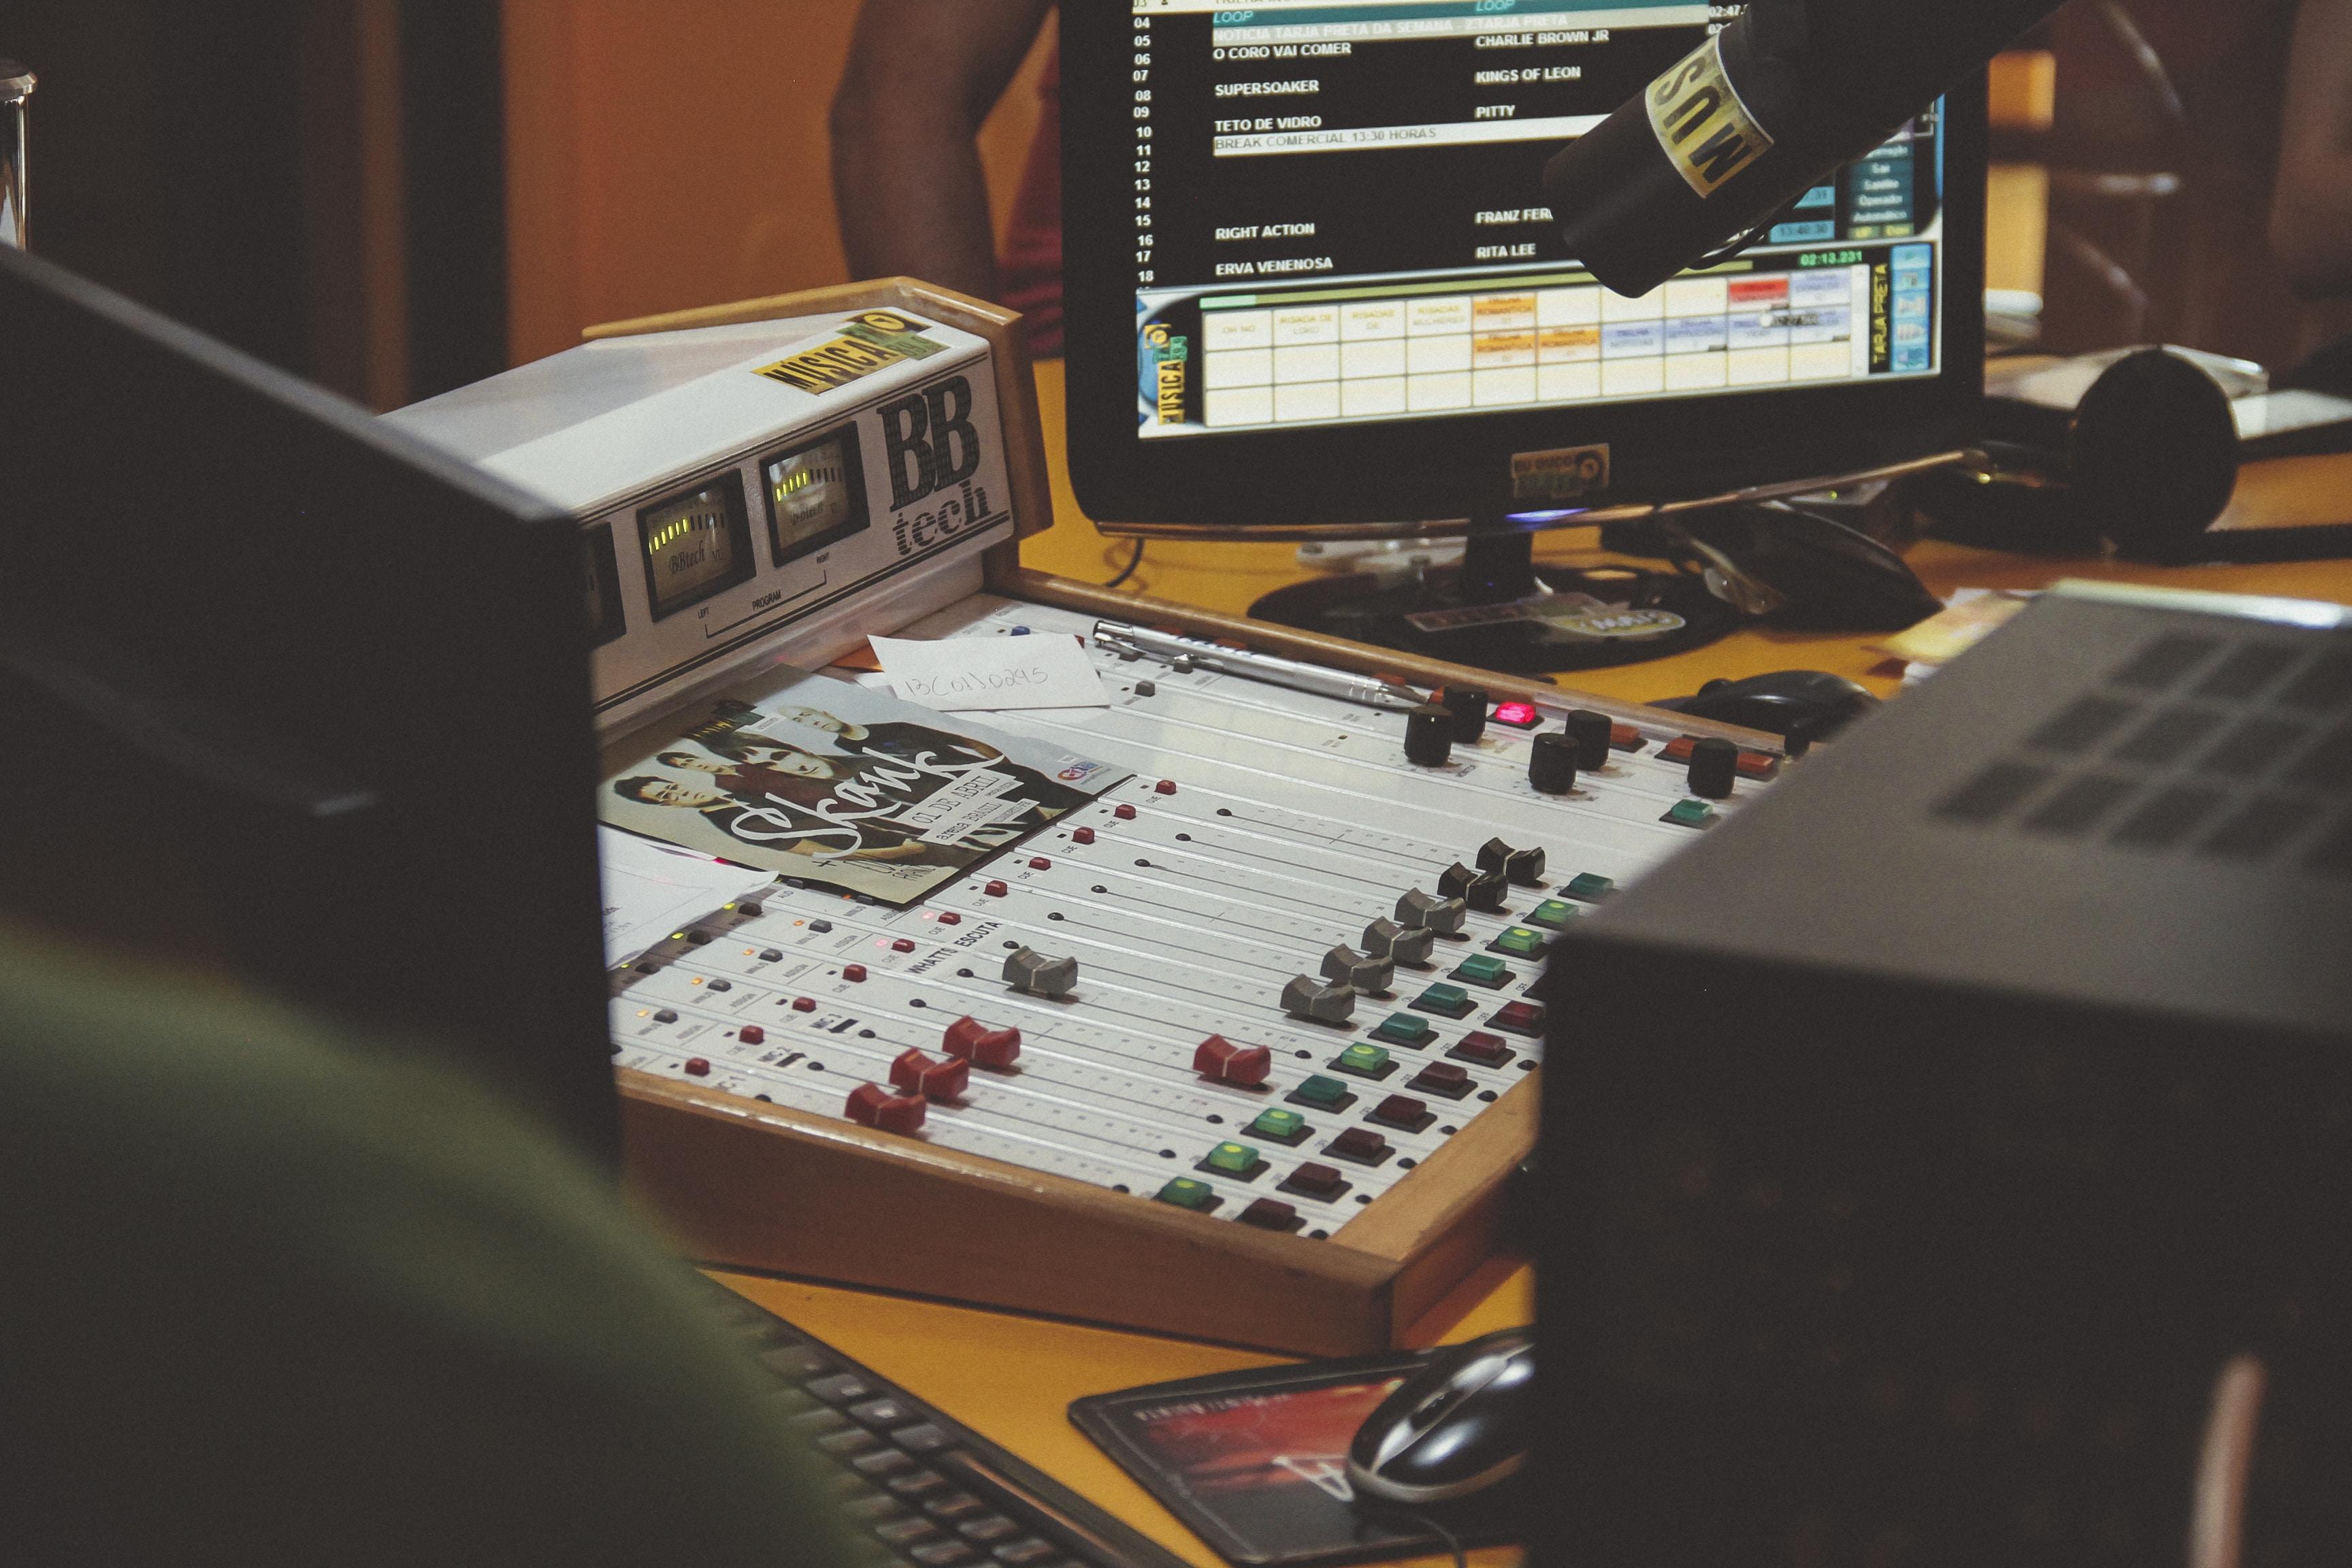 white audio mixer beside black flat screen computer monitor